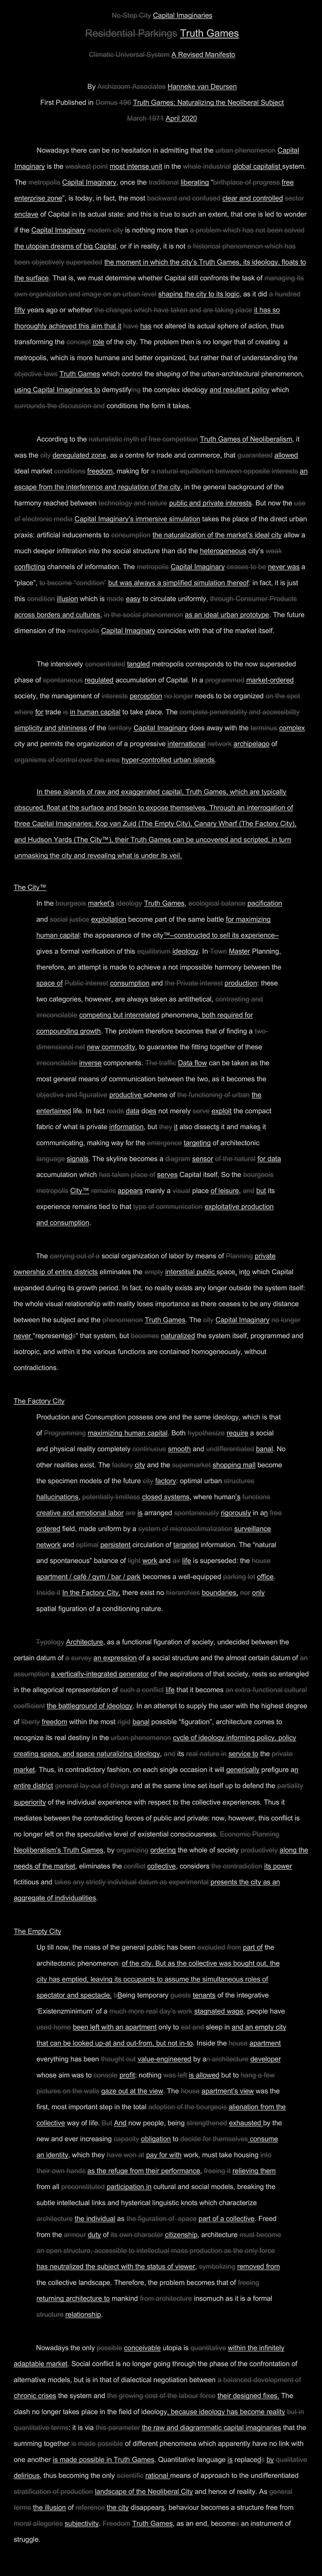 Revised Manifesto.png